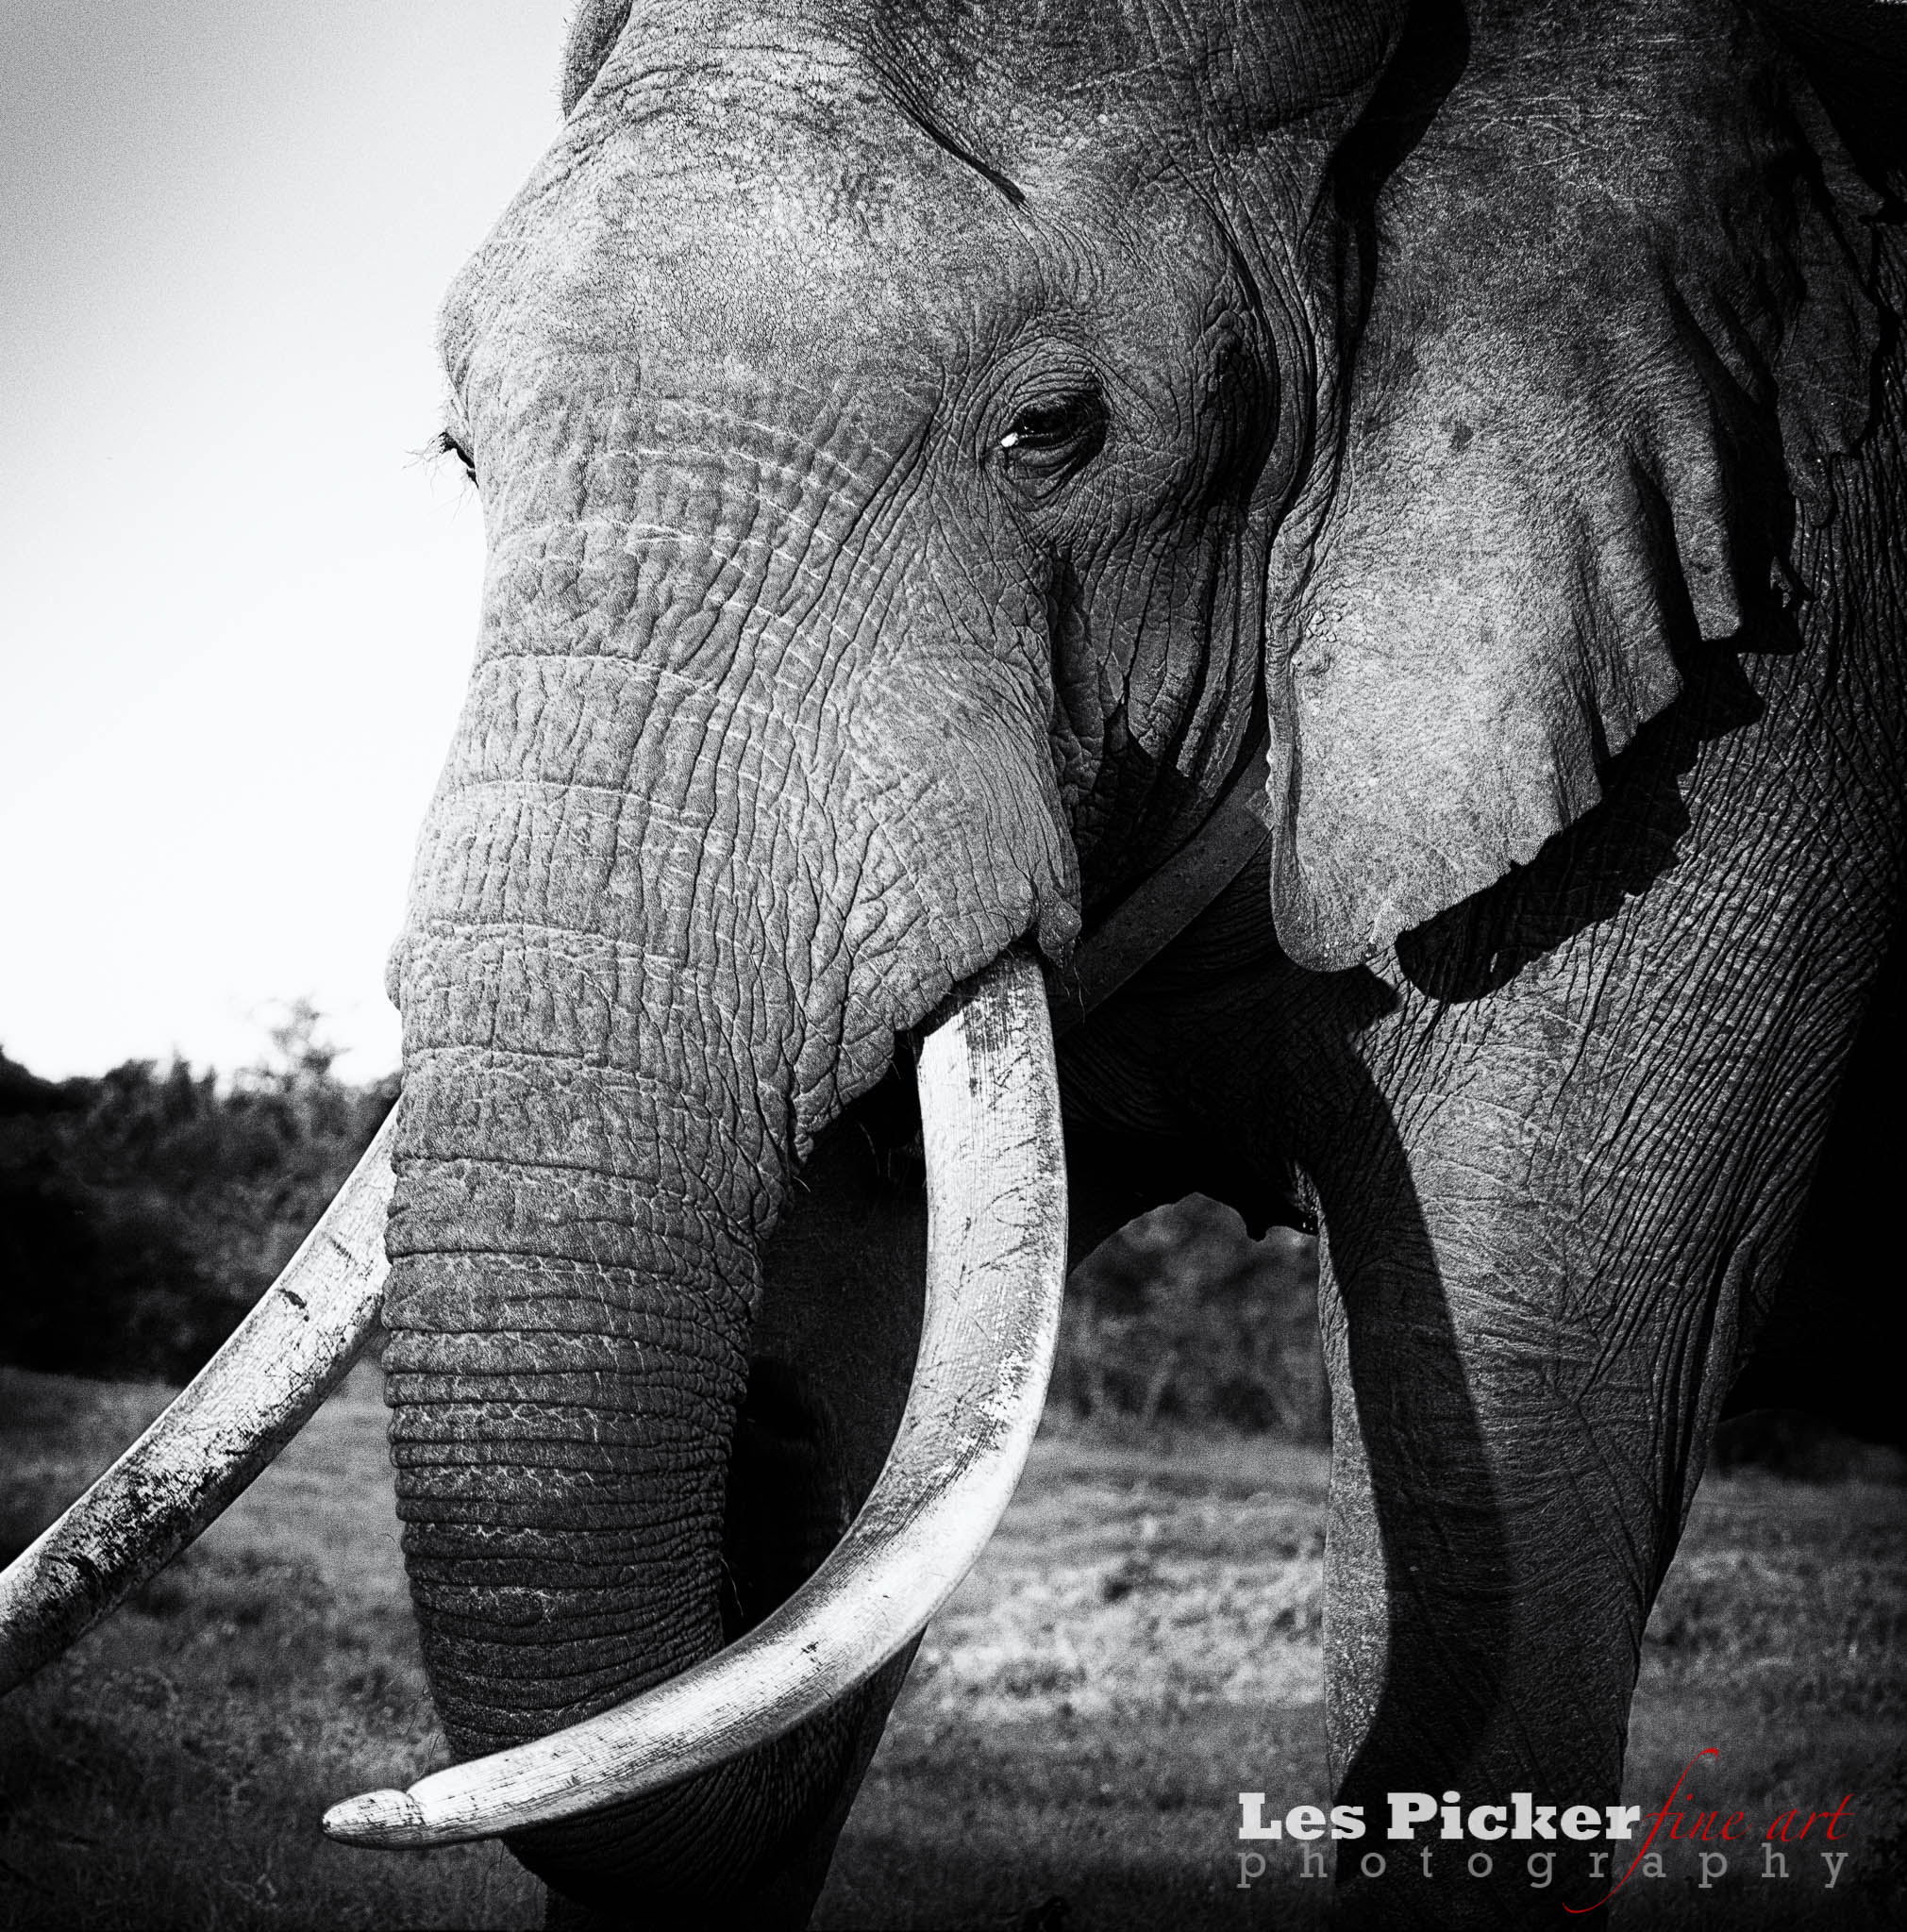 pink elephants and trauma recovery